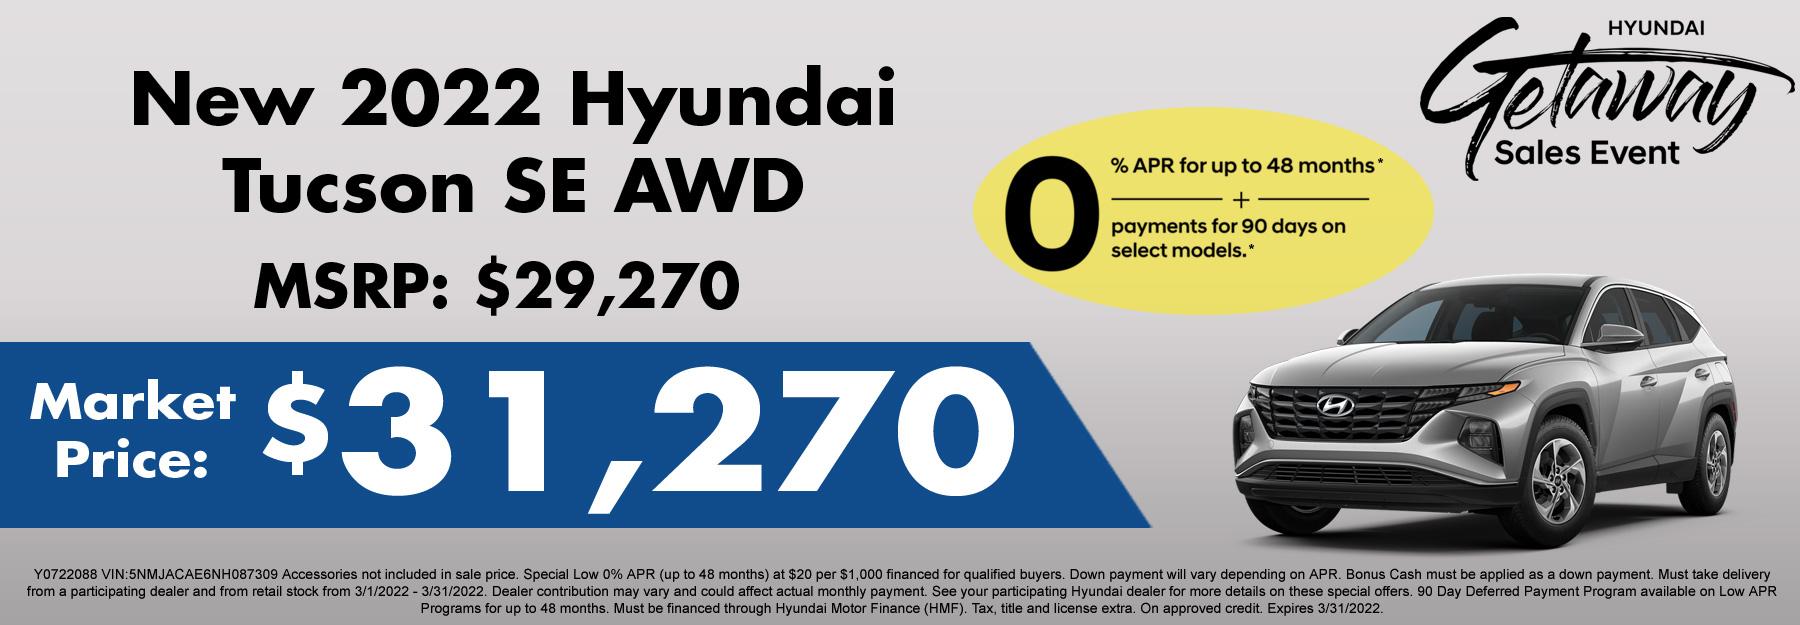 New Hyundai Tucson Special